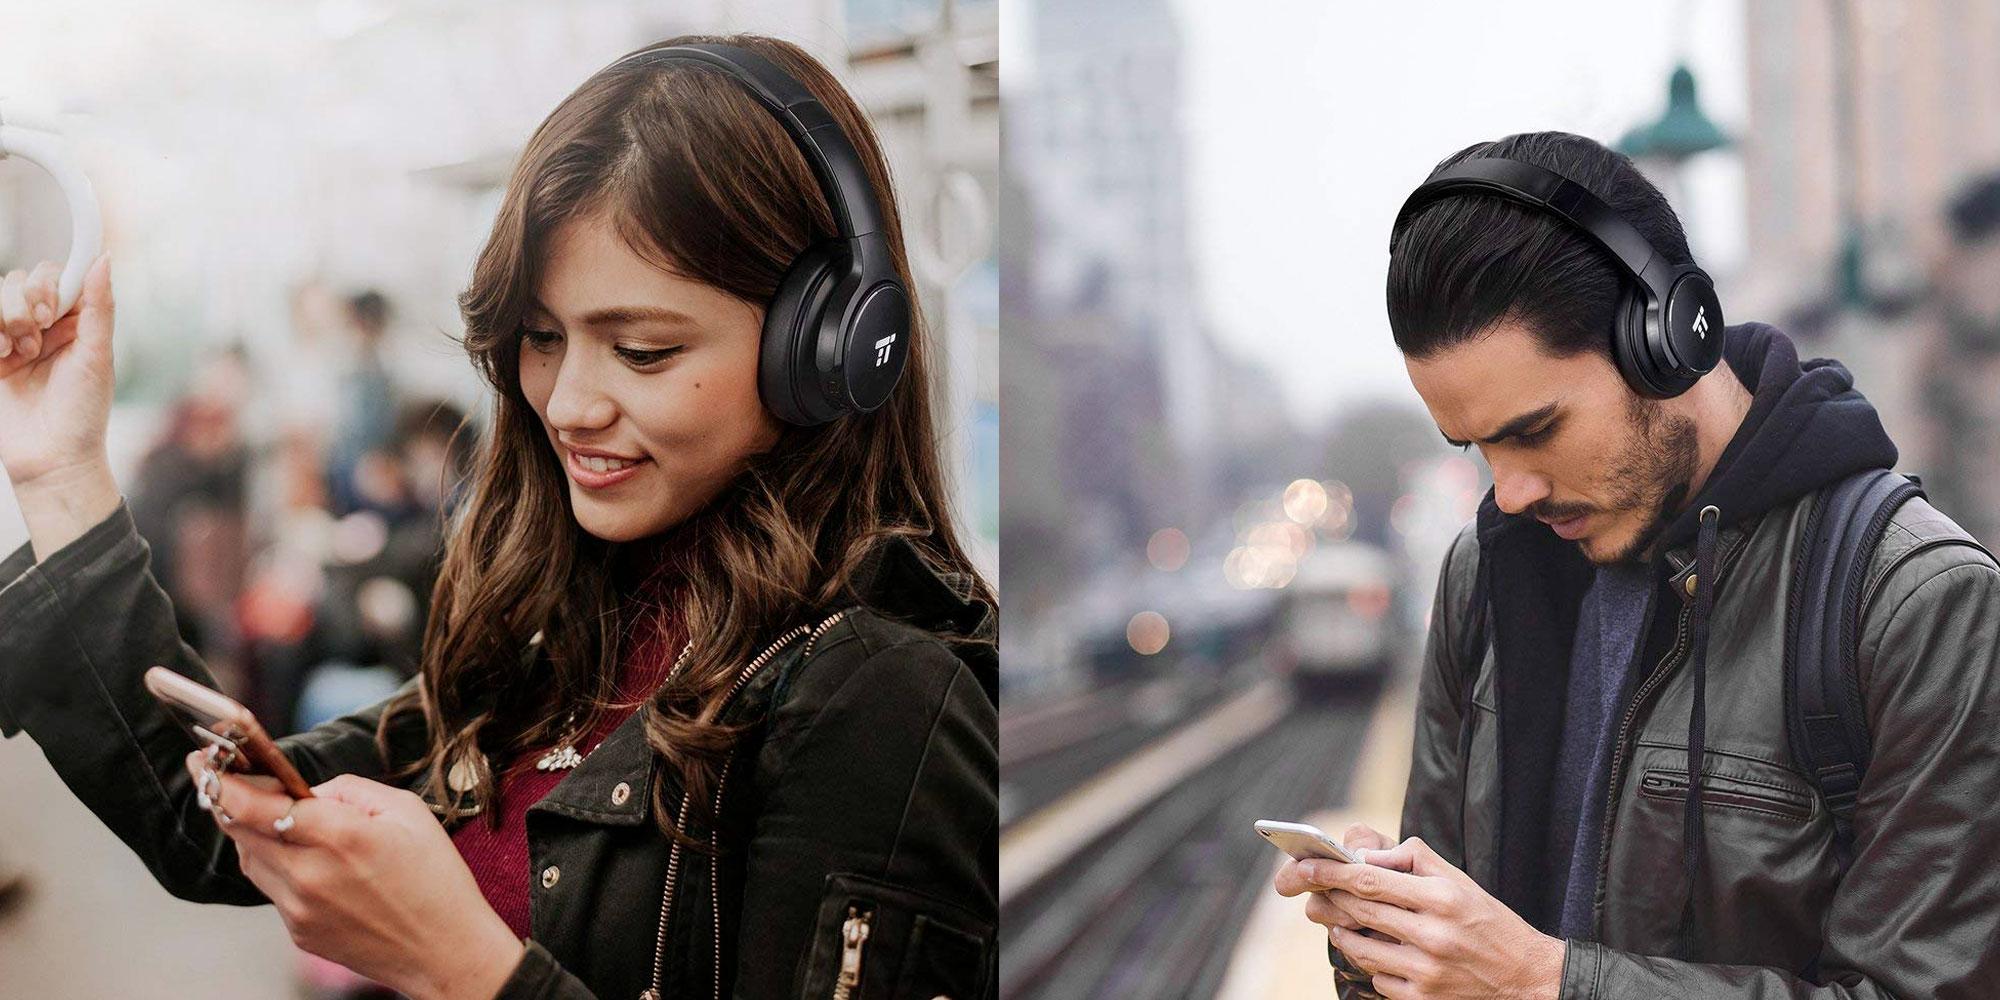 Apple wireless earbuds accessories - apple earbuds wireless new